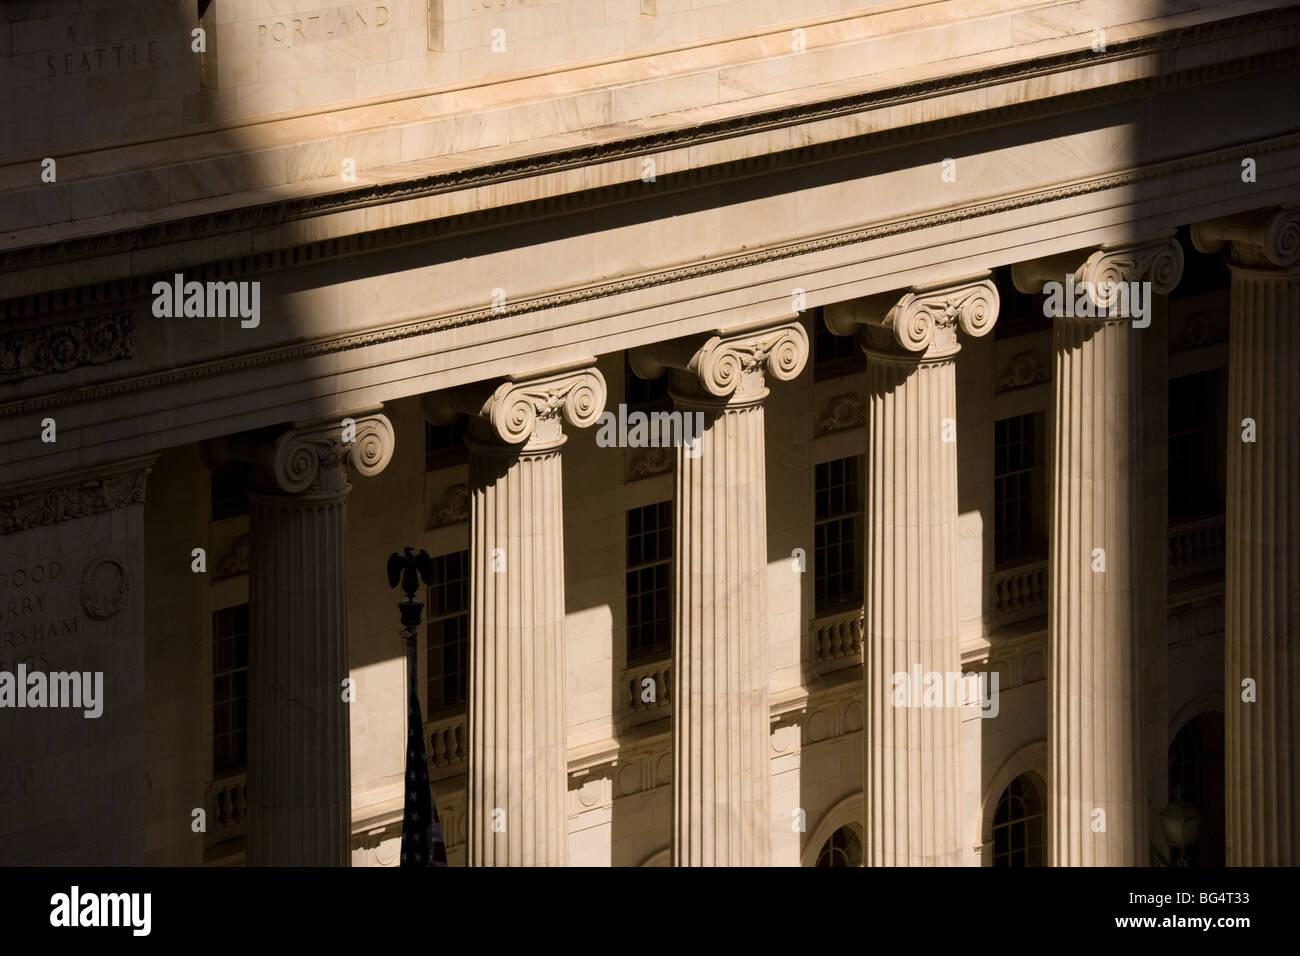 https://c7.alamy.com/comp/BG4T33/colonnade-columns-of-the-byron-white-us-courthouse-denver-colorado-BG4T33.jpg